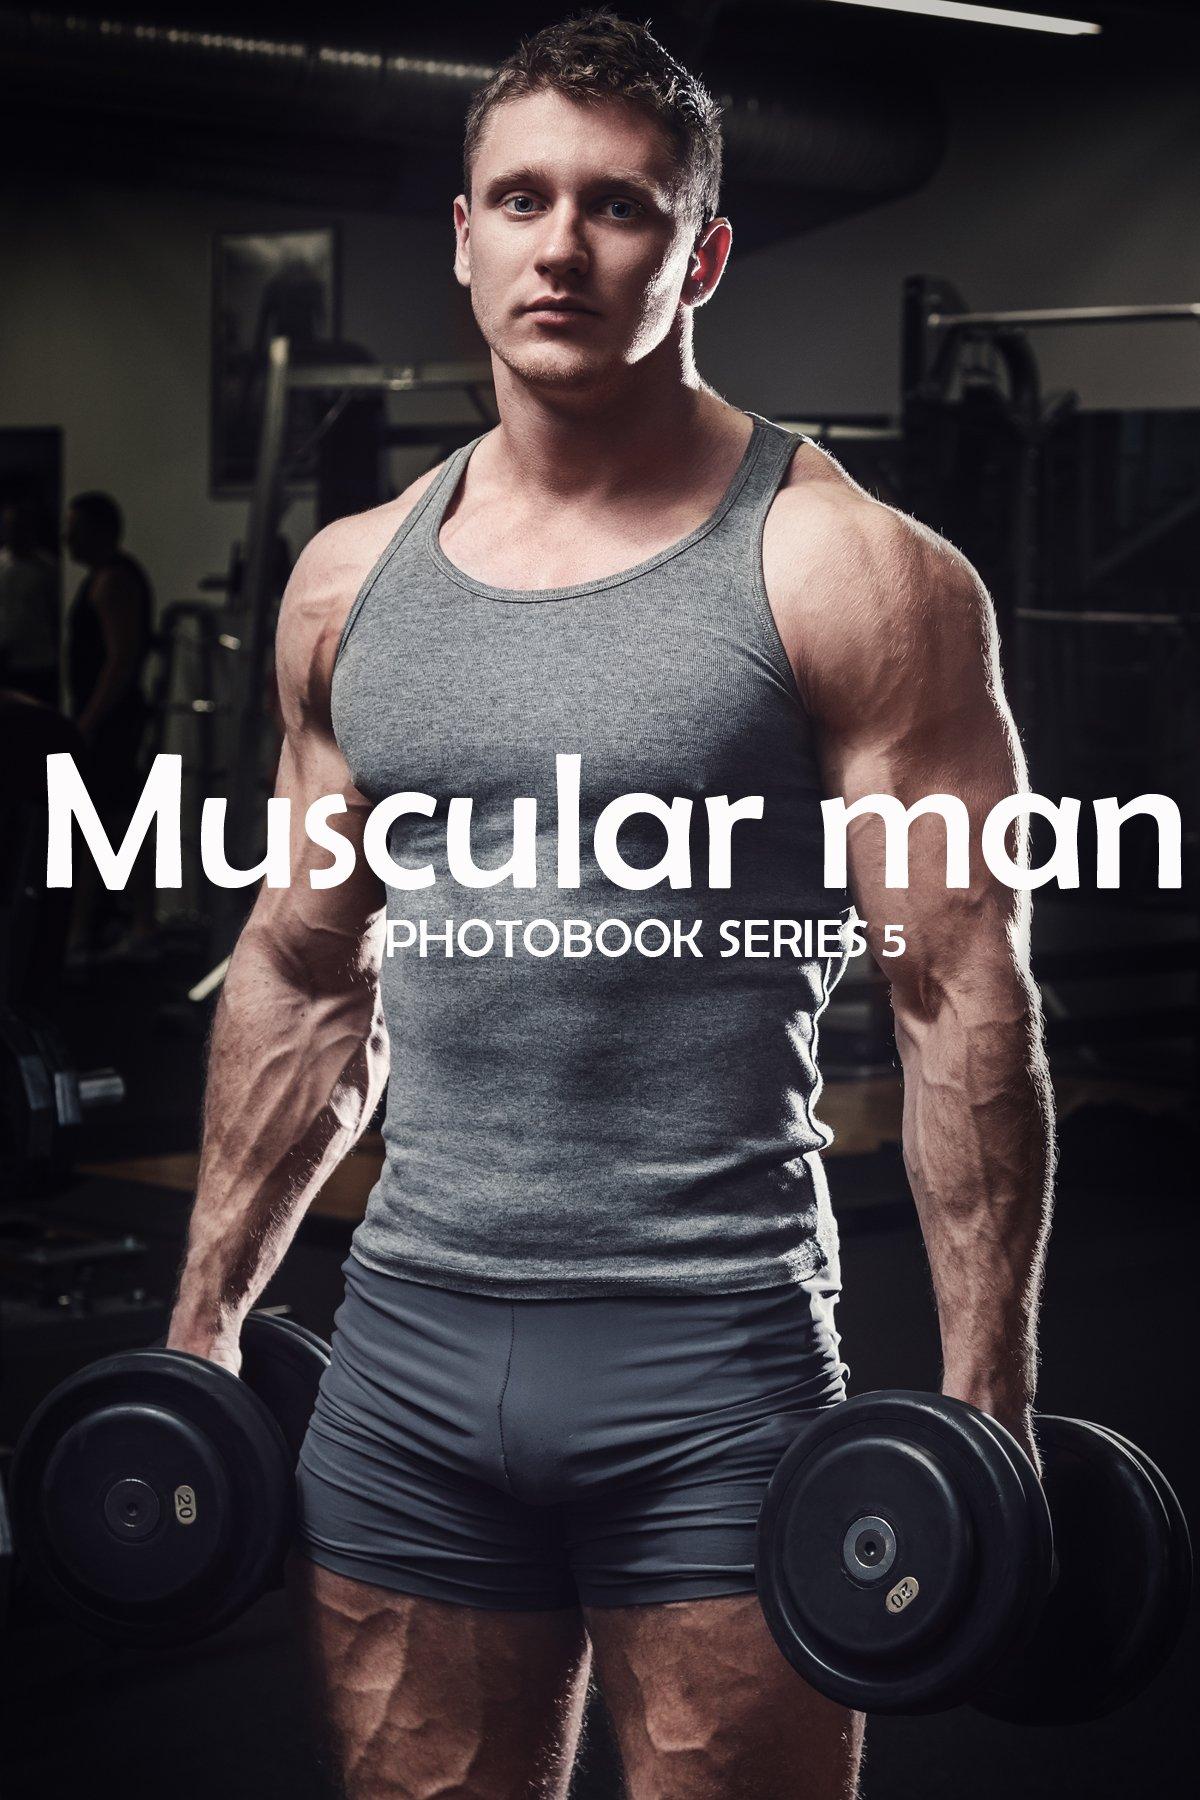 Muscular man (Photo Book) Series 5